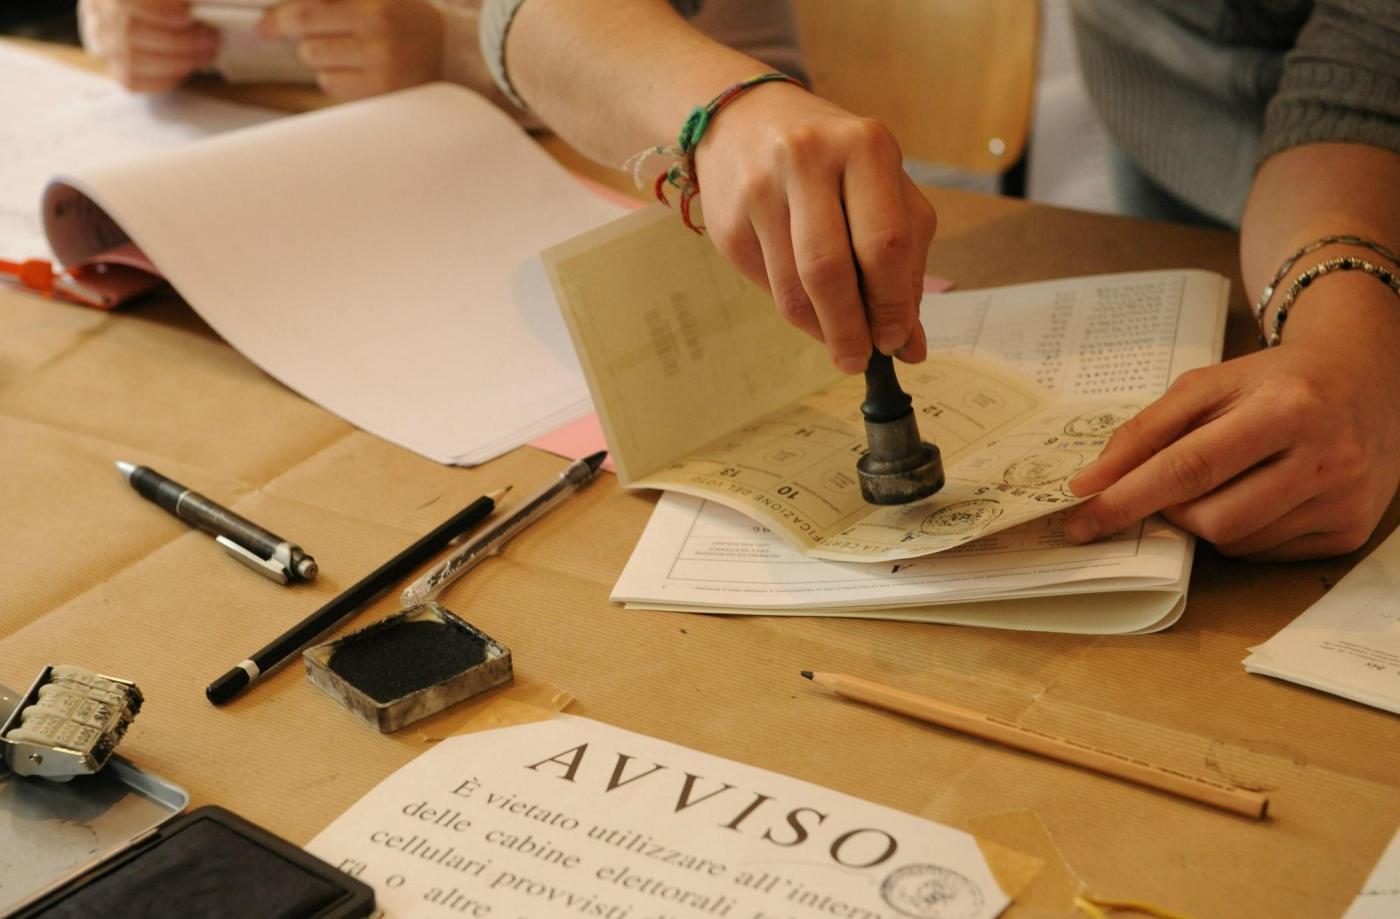 Elezioni comunali Perugia e Terni 2014: tutti i candidati